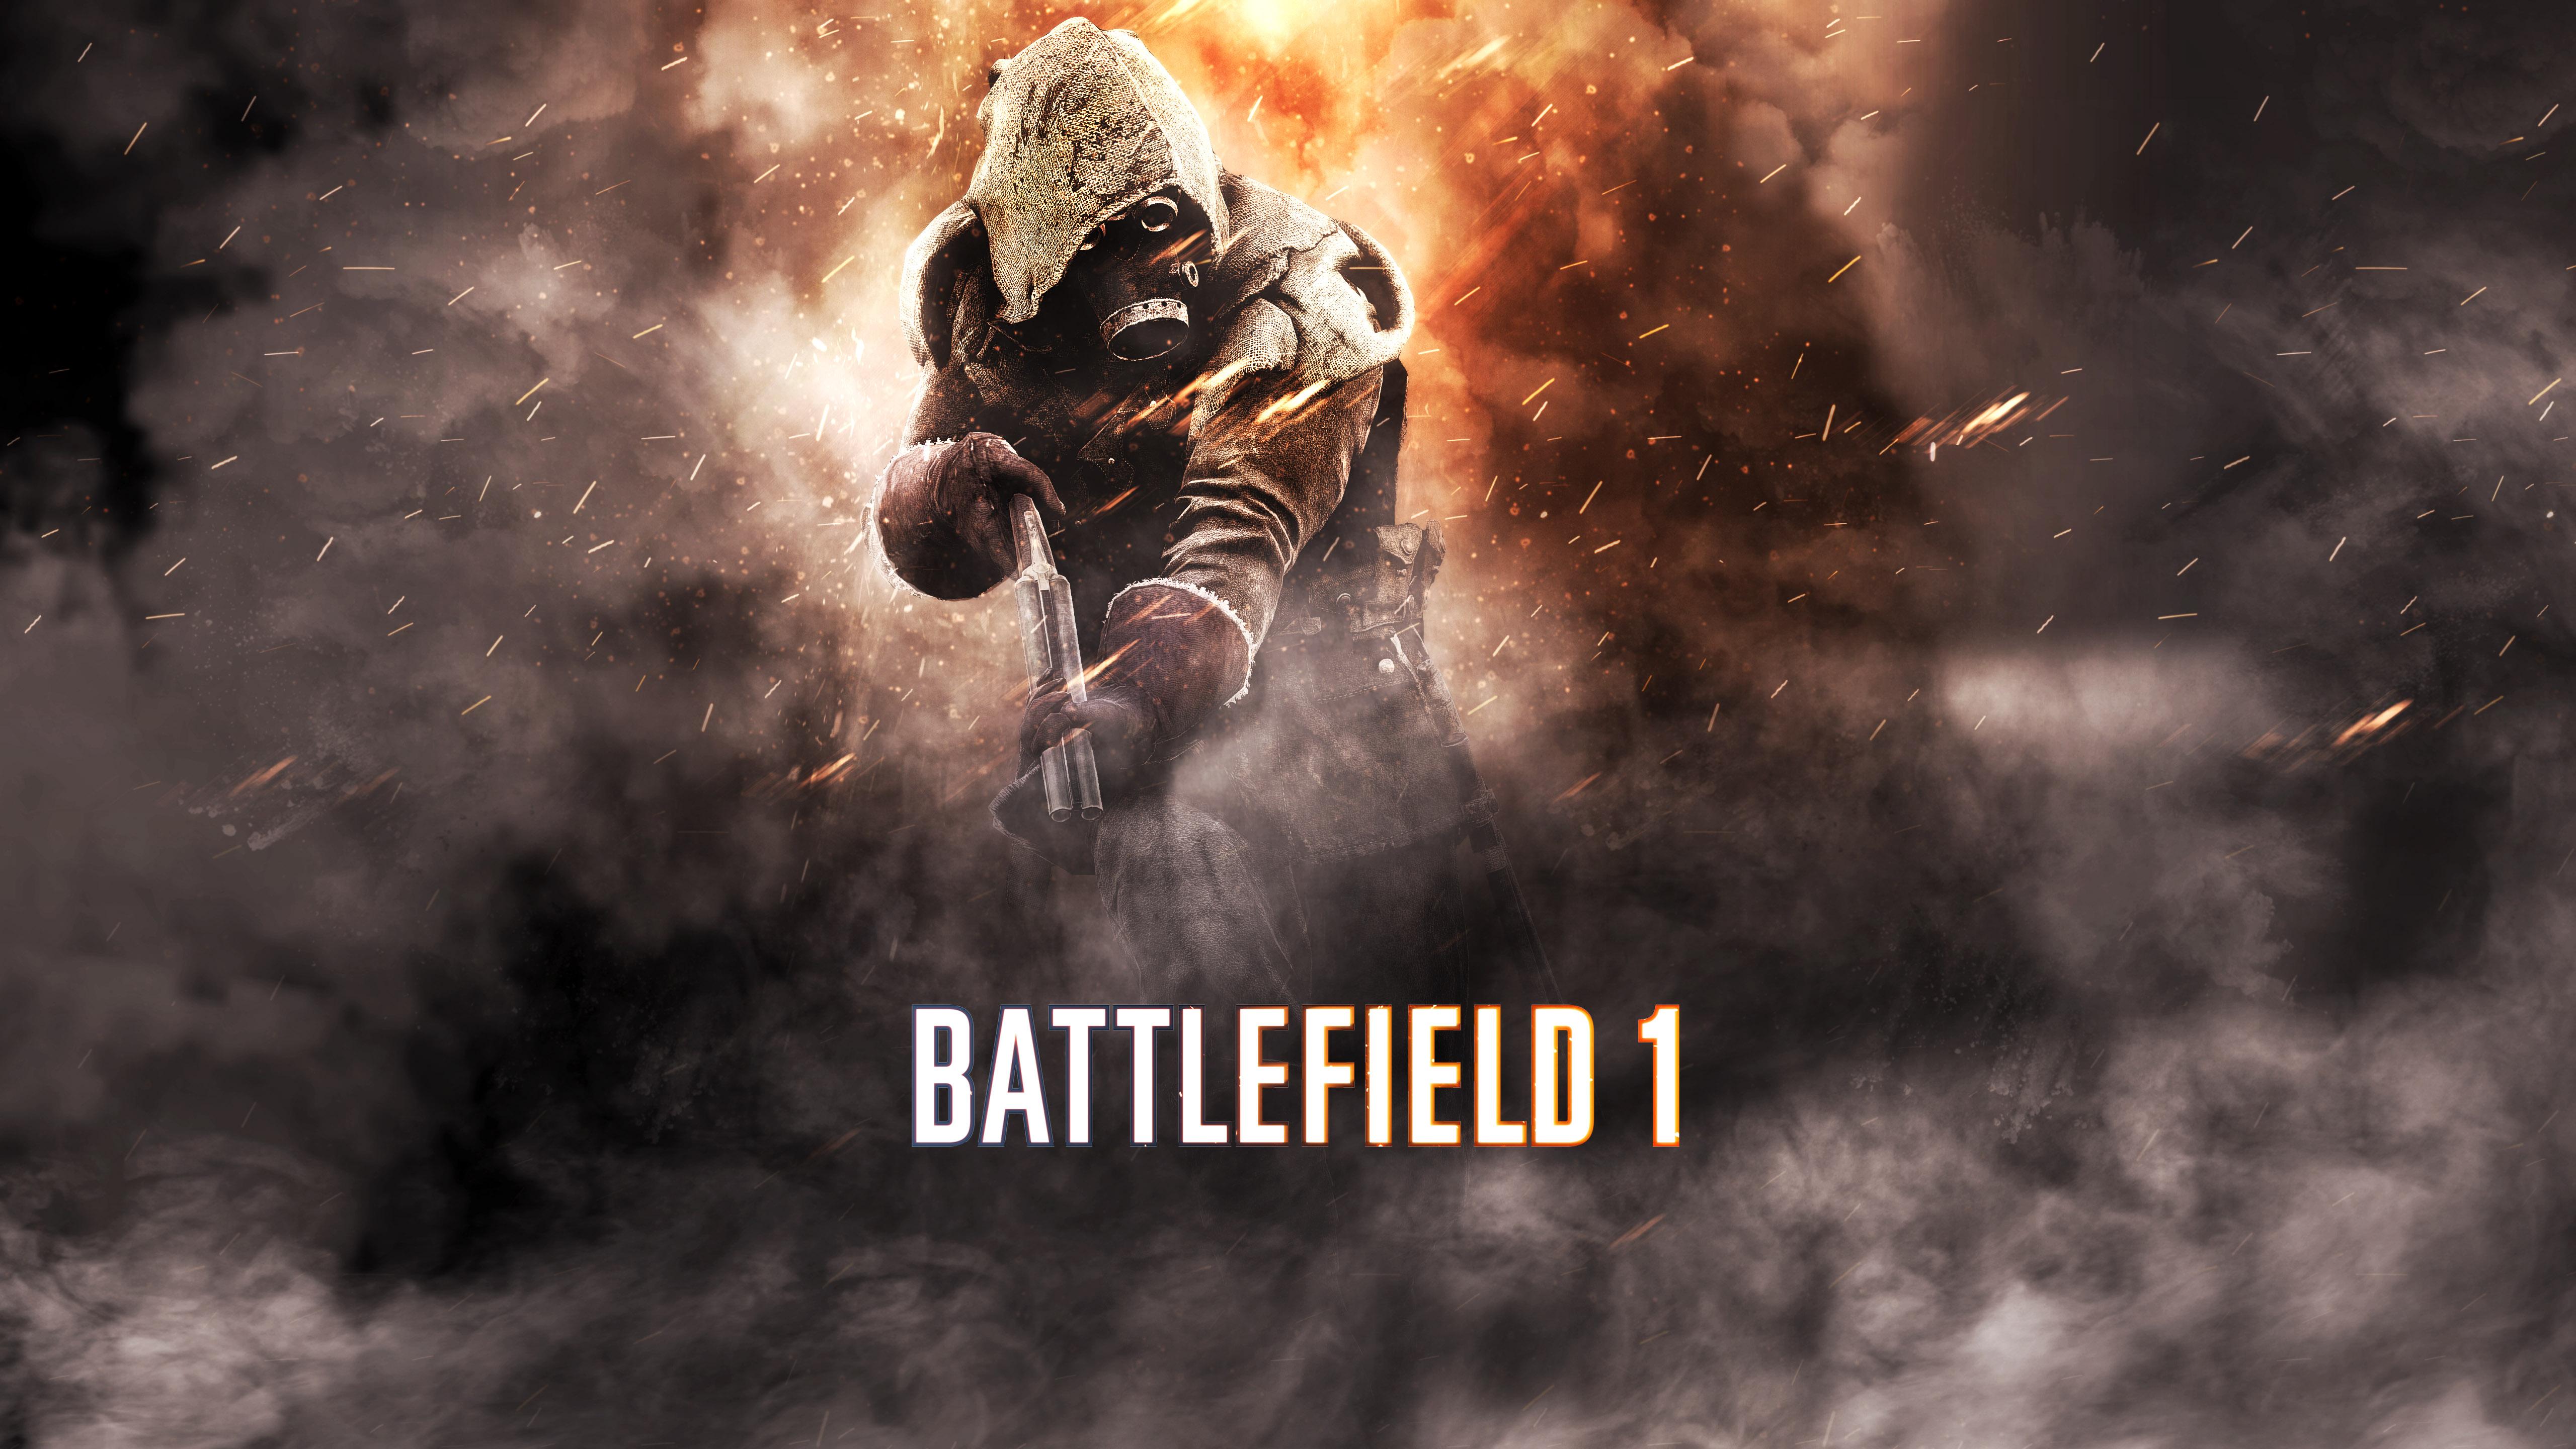 Battlefield 1 Video Game 4k Hd Games 4k Wallpapers Images